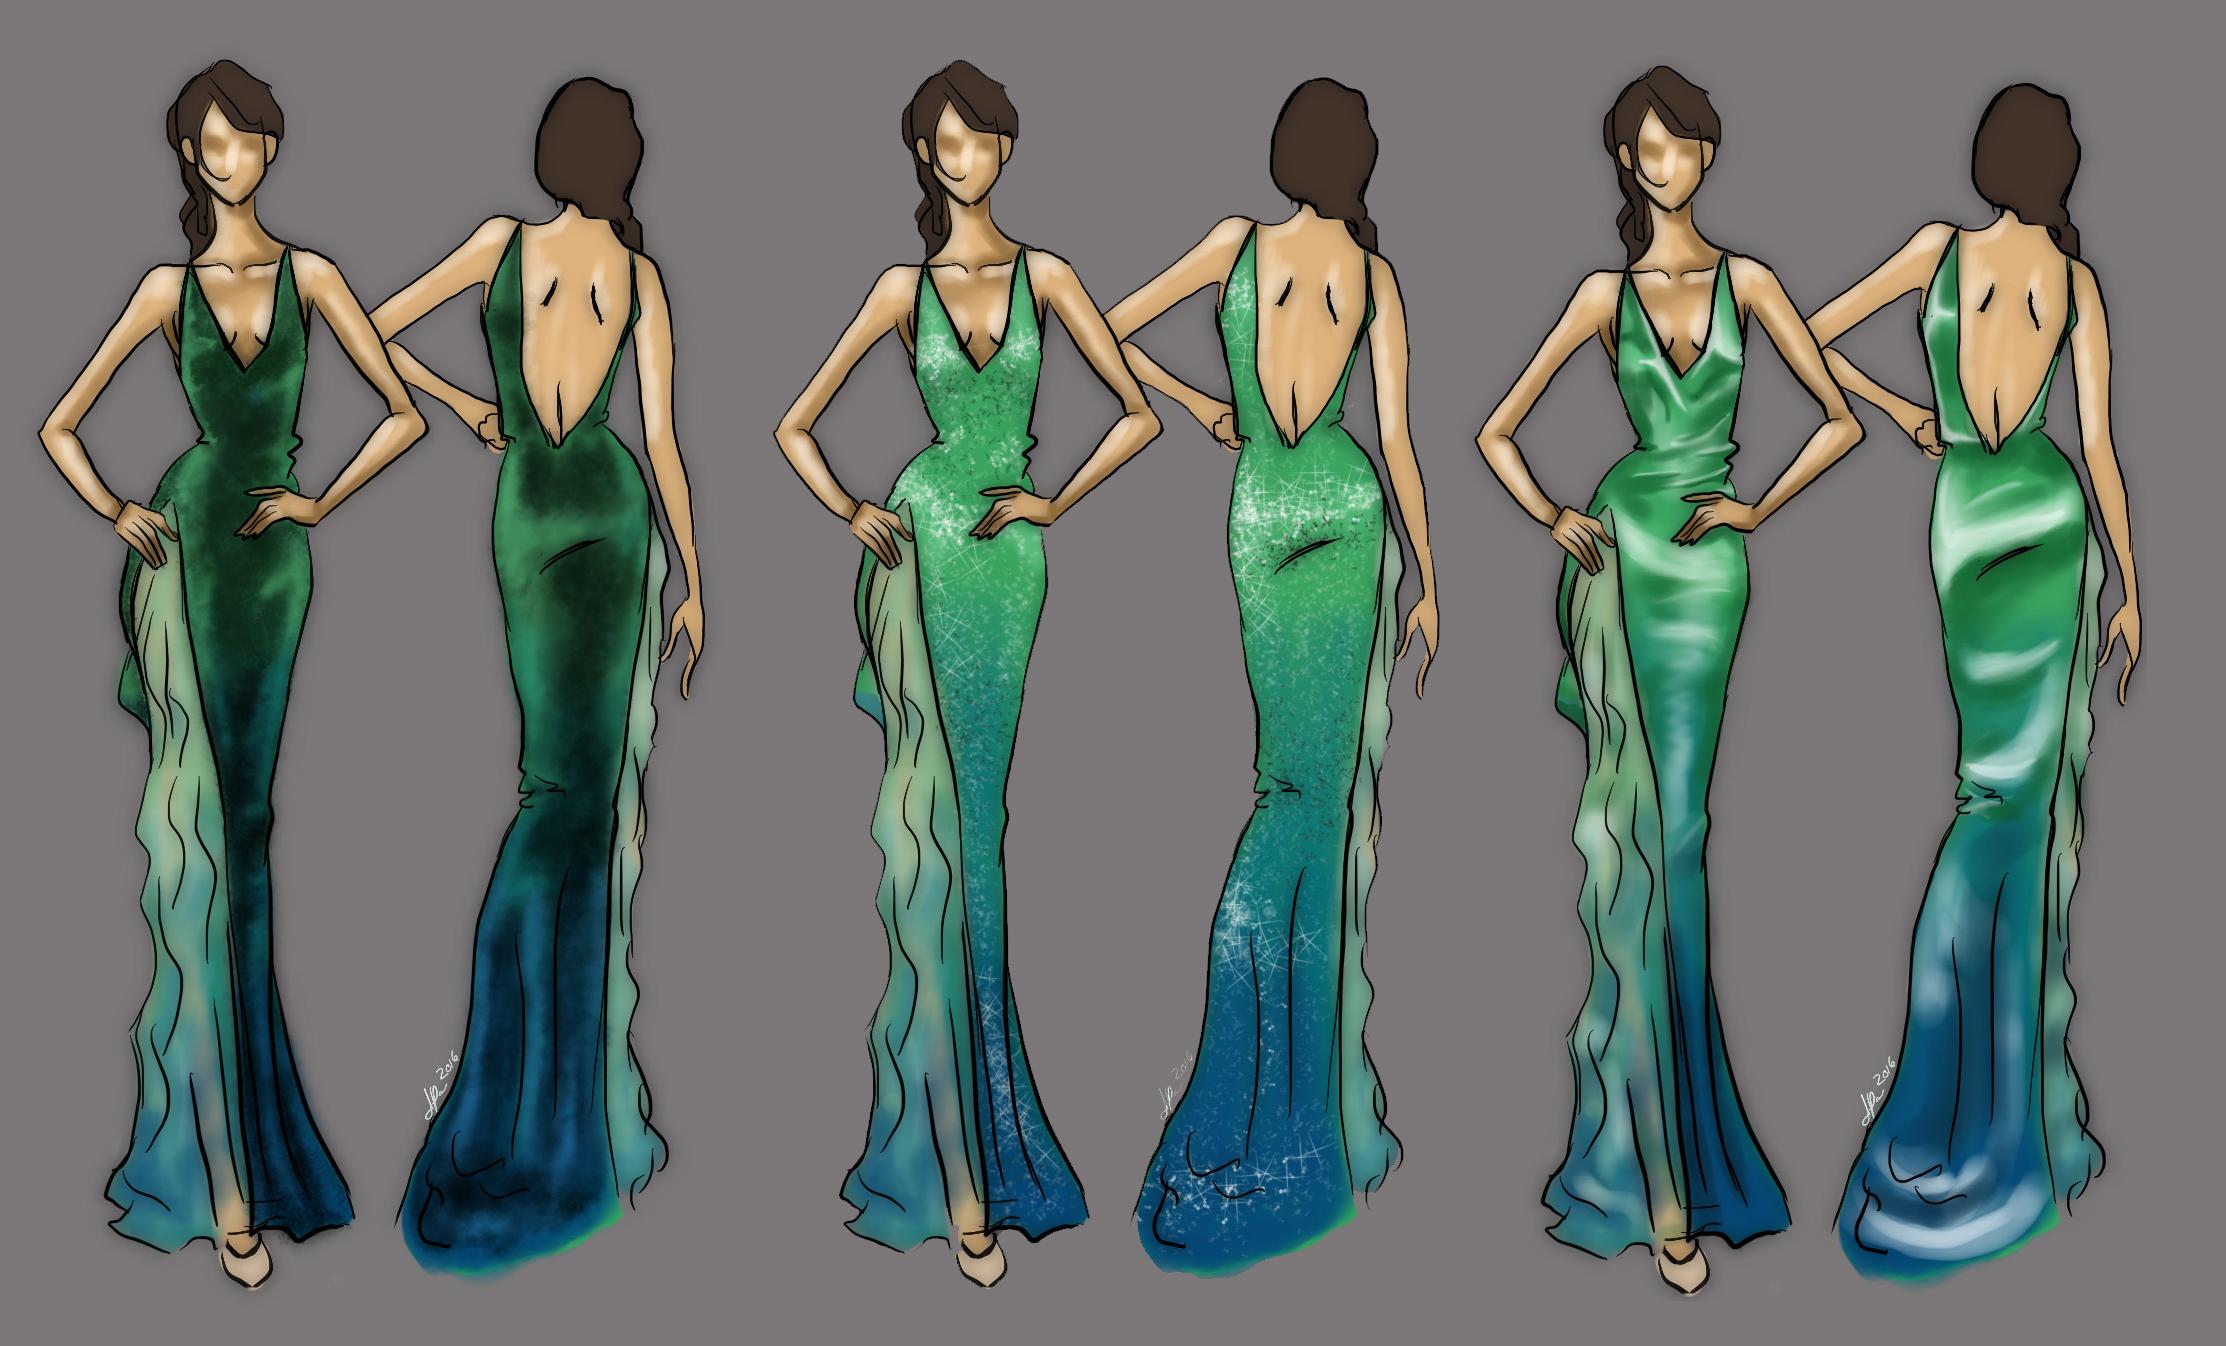 Fashion Design Tutorial 4: Fabrics & Materials - YouTube